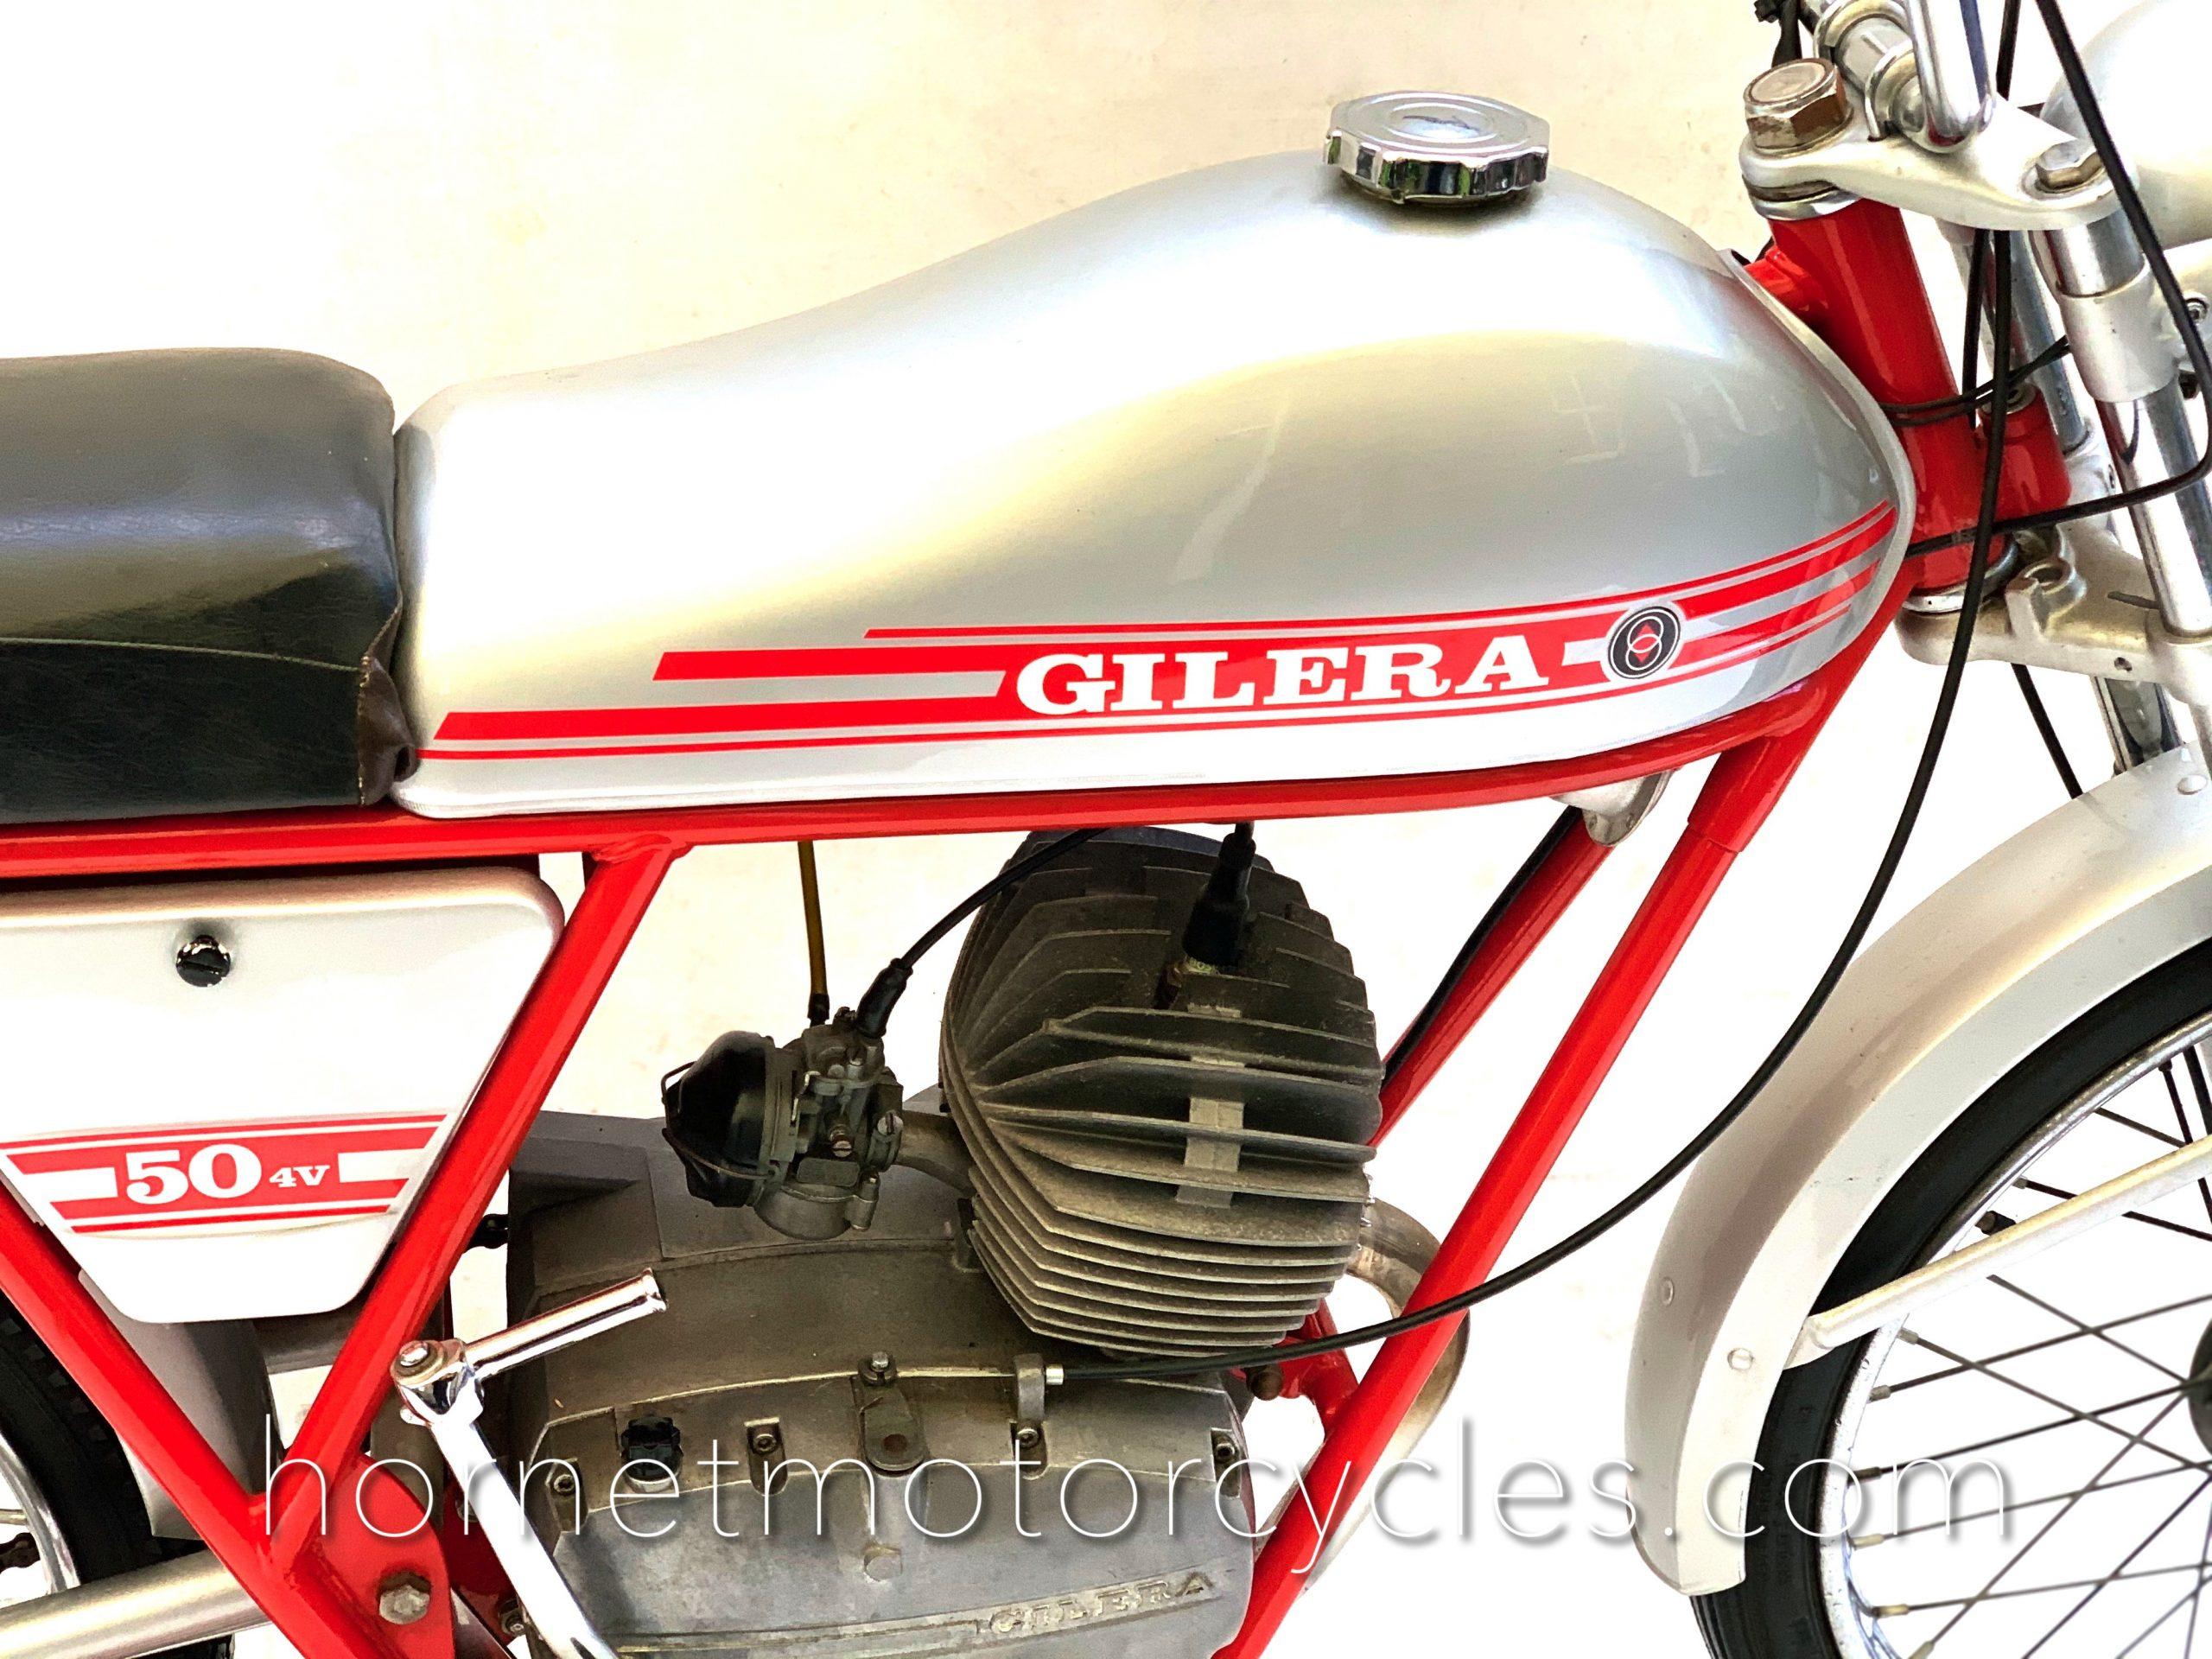 Gilera Touring 50 4V